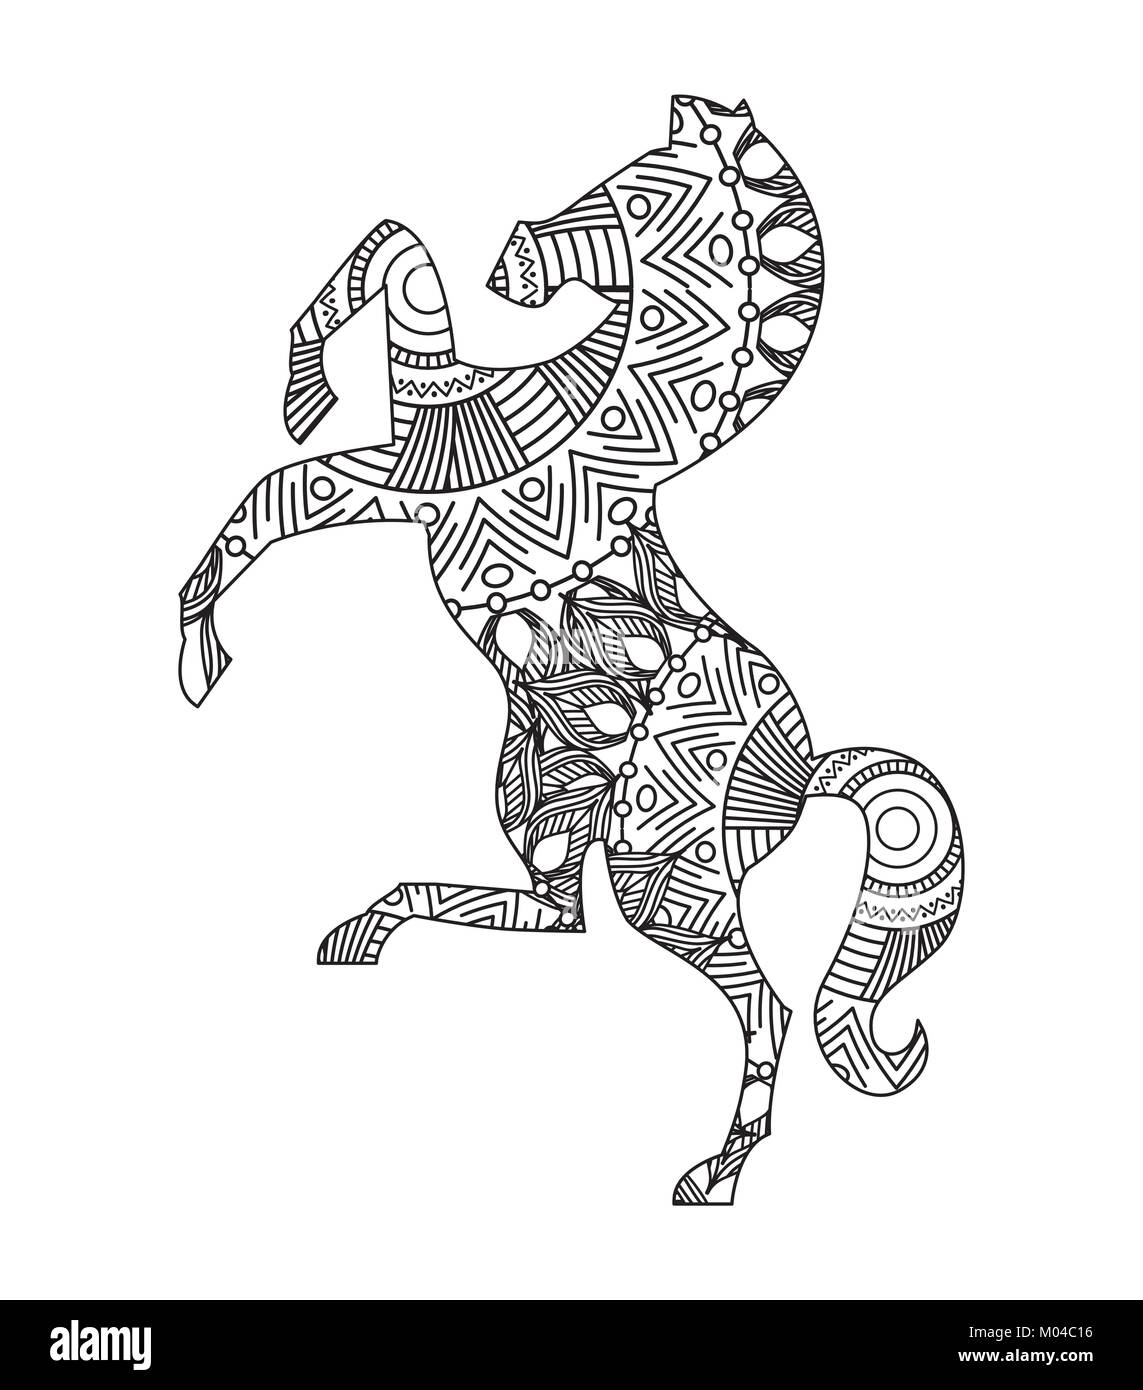 Dibujo de caballo para colorear zentangle adulto página Ilustración ...